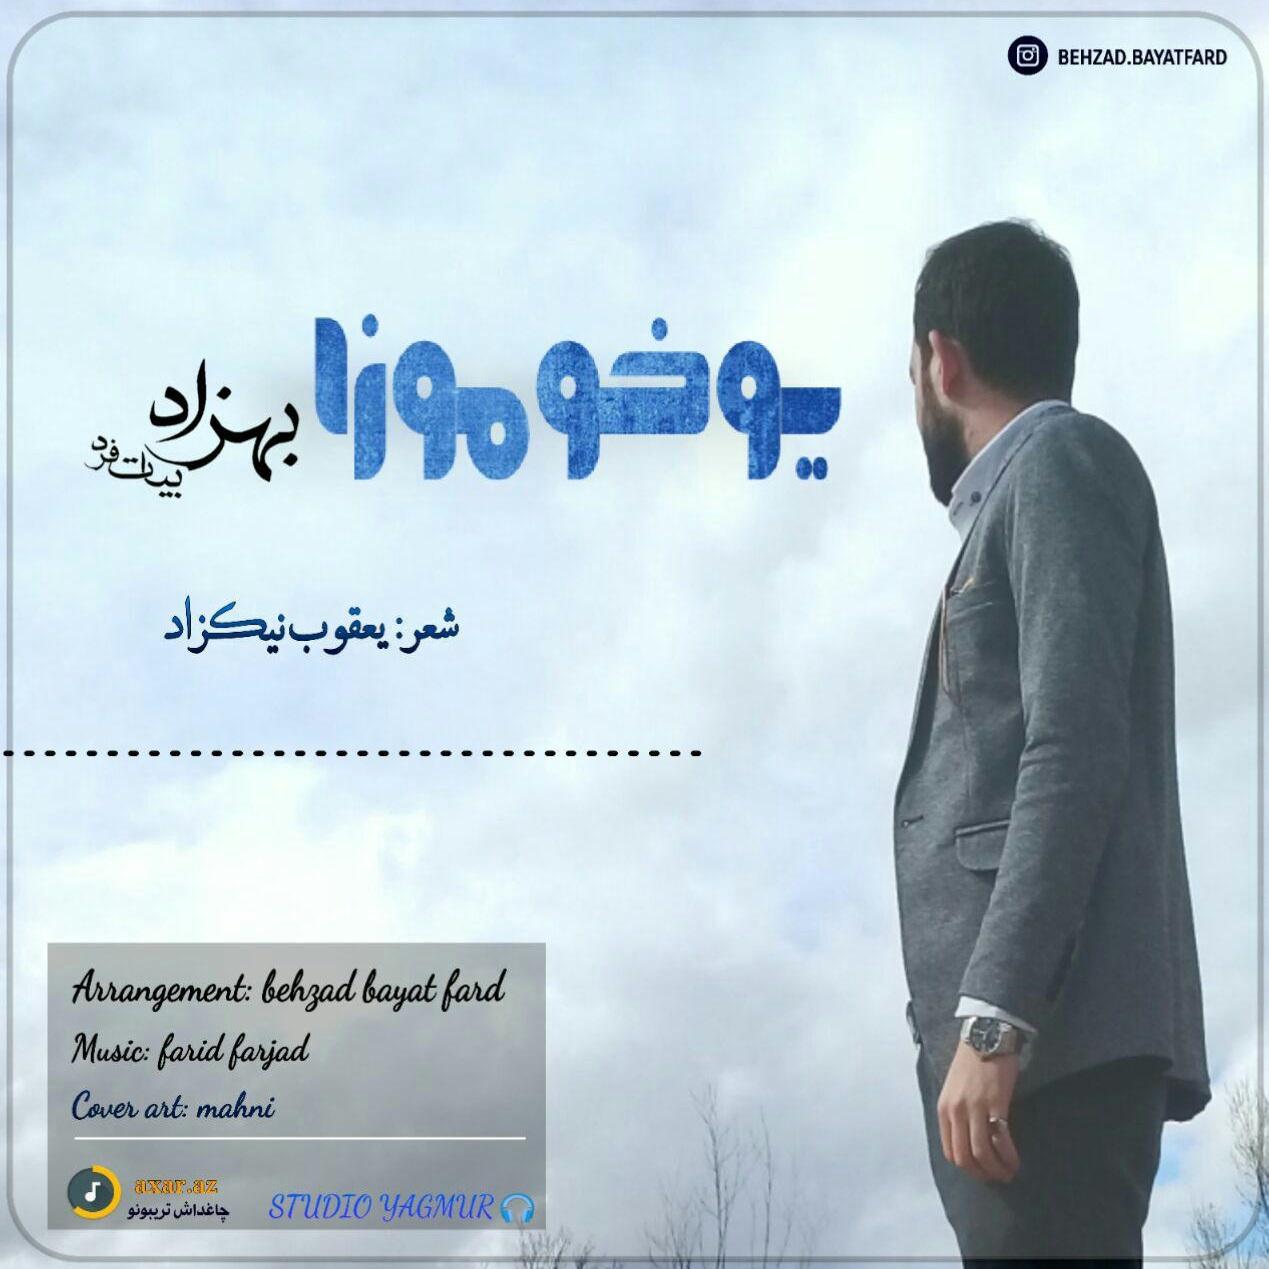 http://s8.picofile.com/file/8366265142/09Behzad_Bayatfard_Yuxumuza.jpg